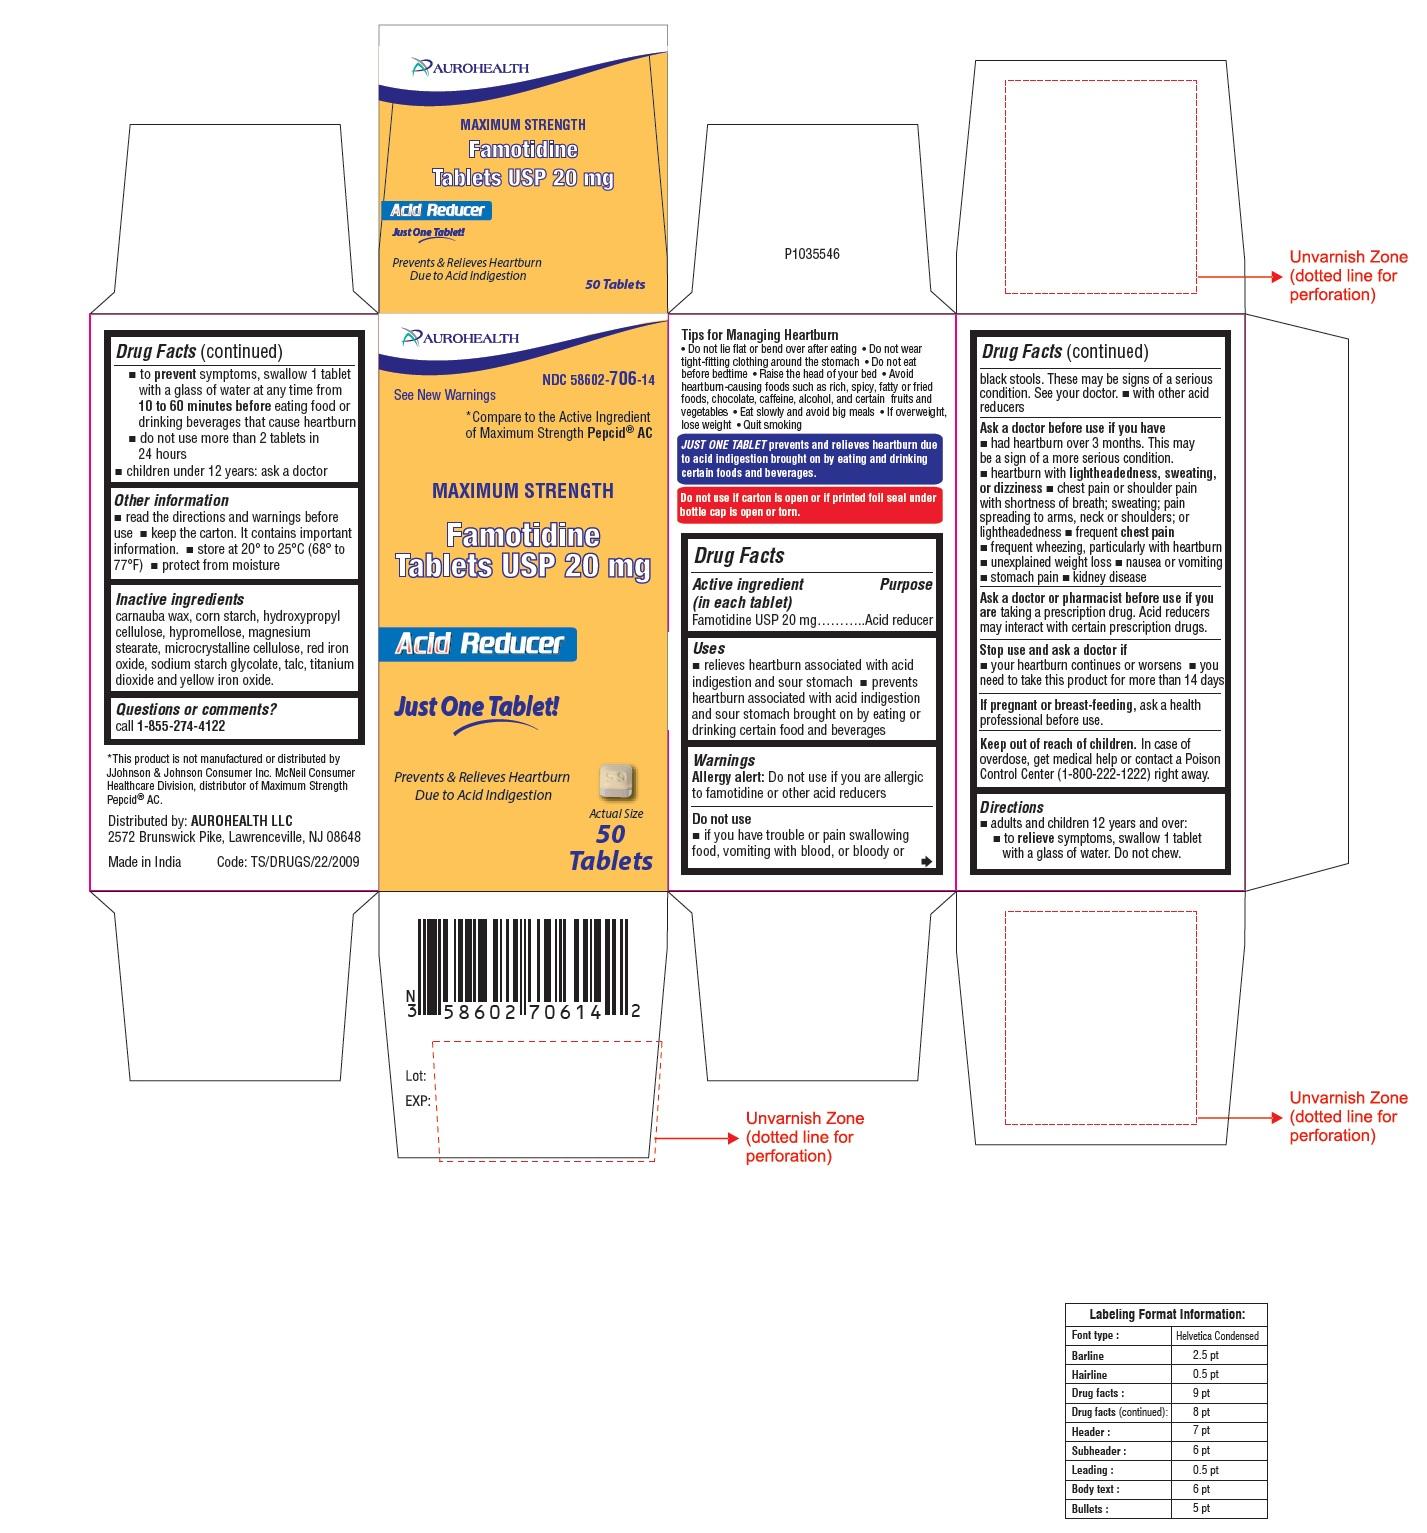 famotidine-20mg-fig2.jpg